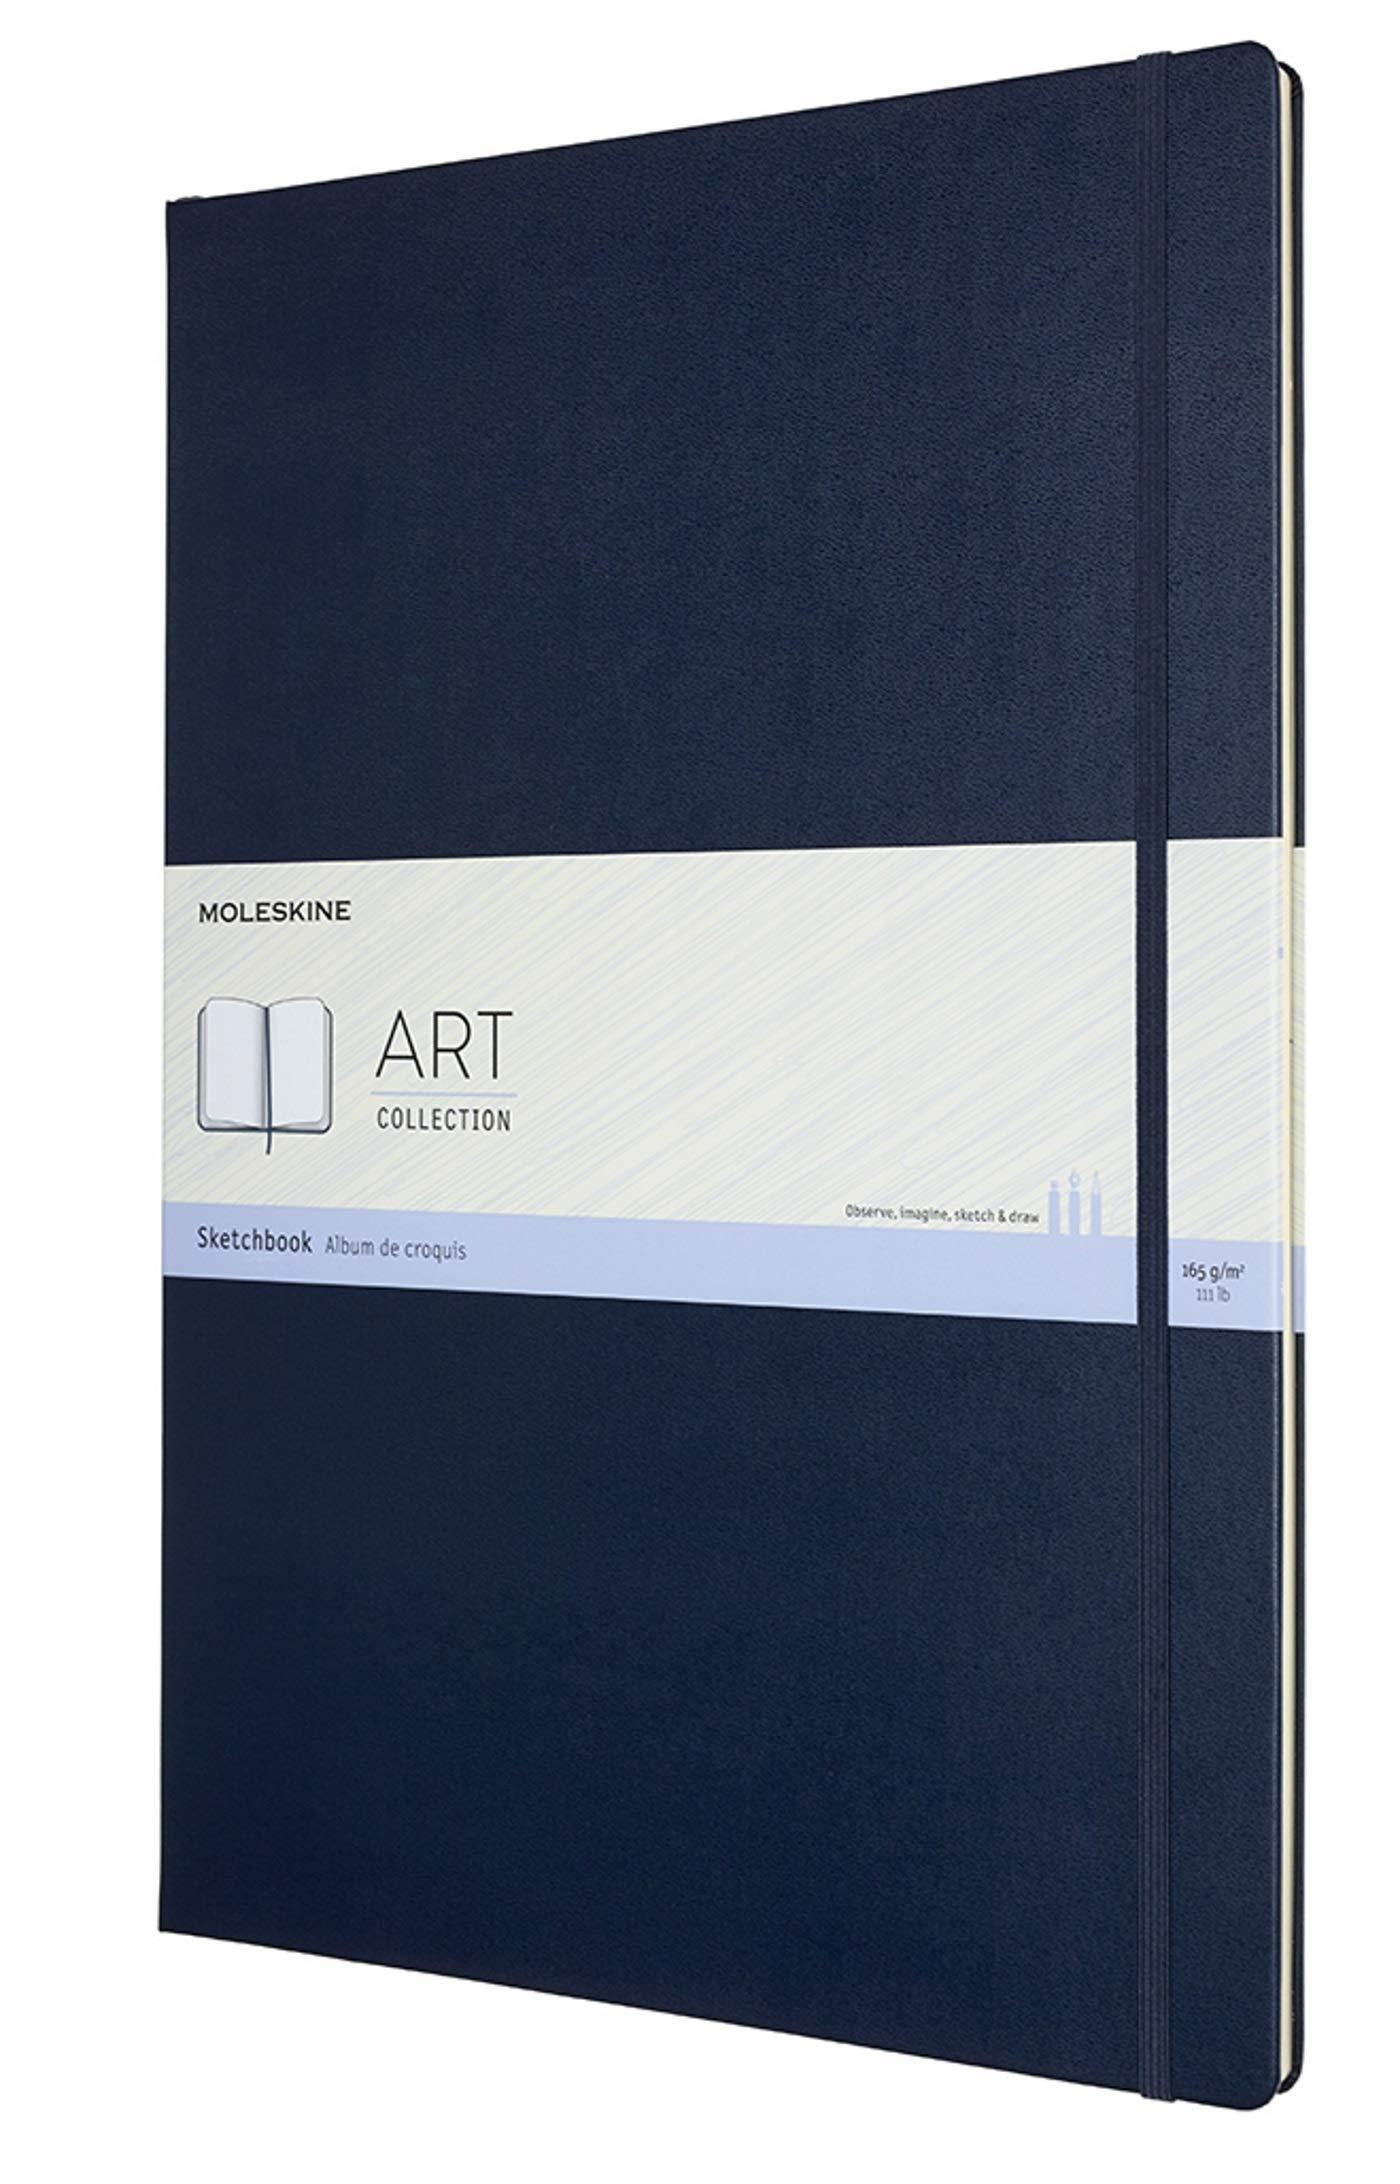 Moleskine Art Sketchbook, Hard Cover, A3 (11.75'' x 16.5'') Plain/Blank, Sapphire Blue by Moleskine